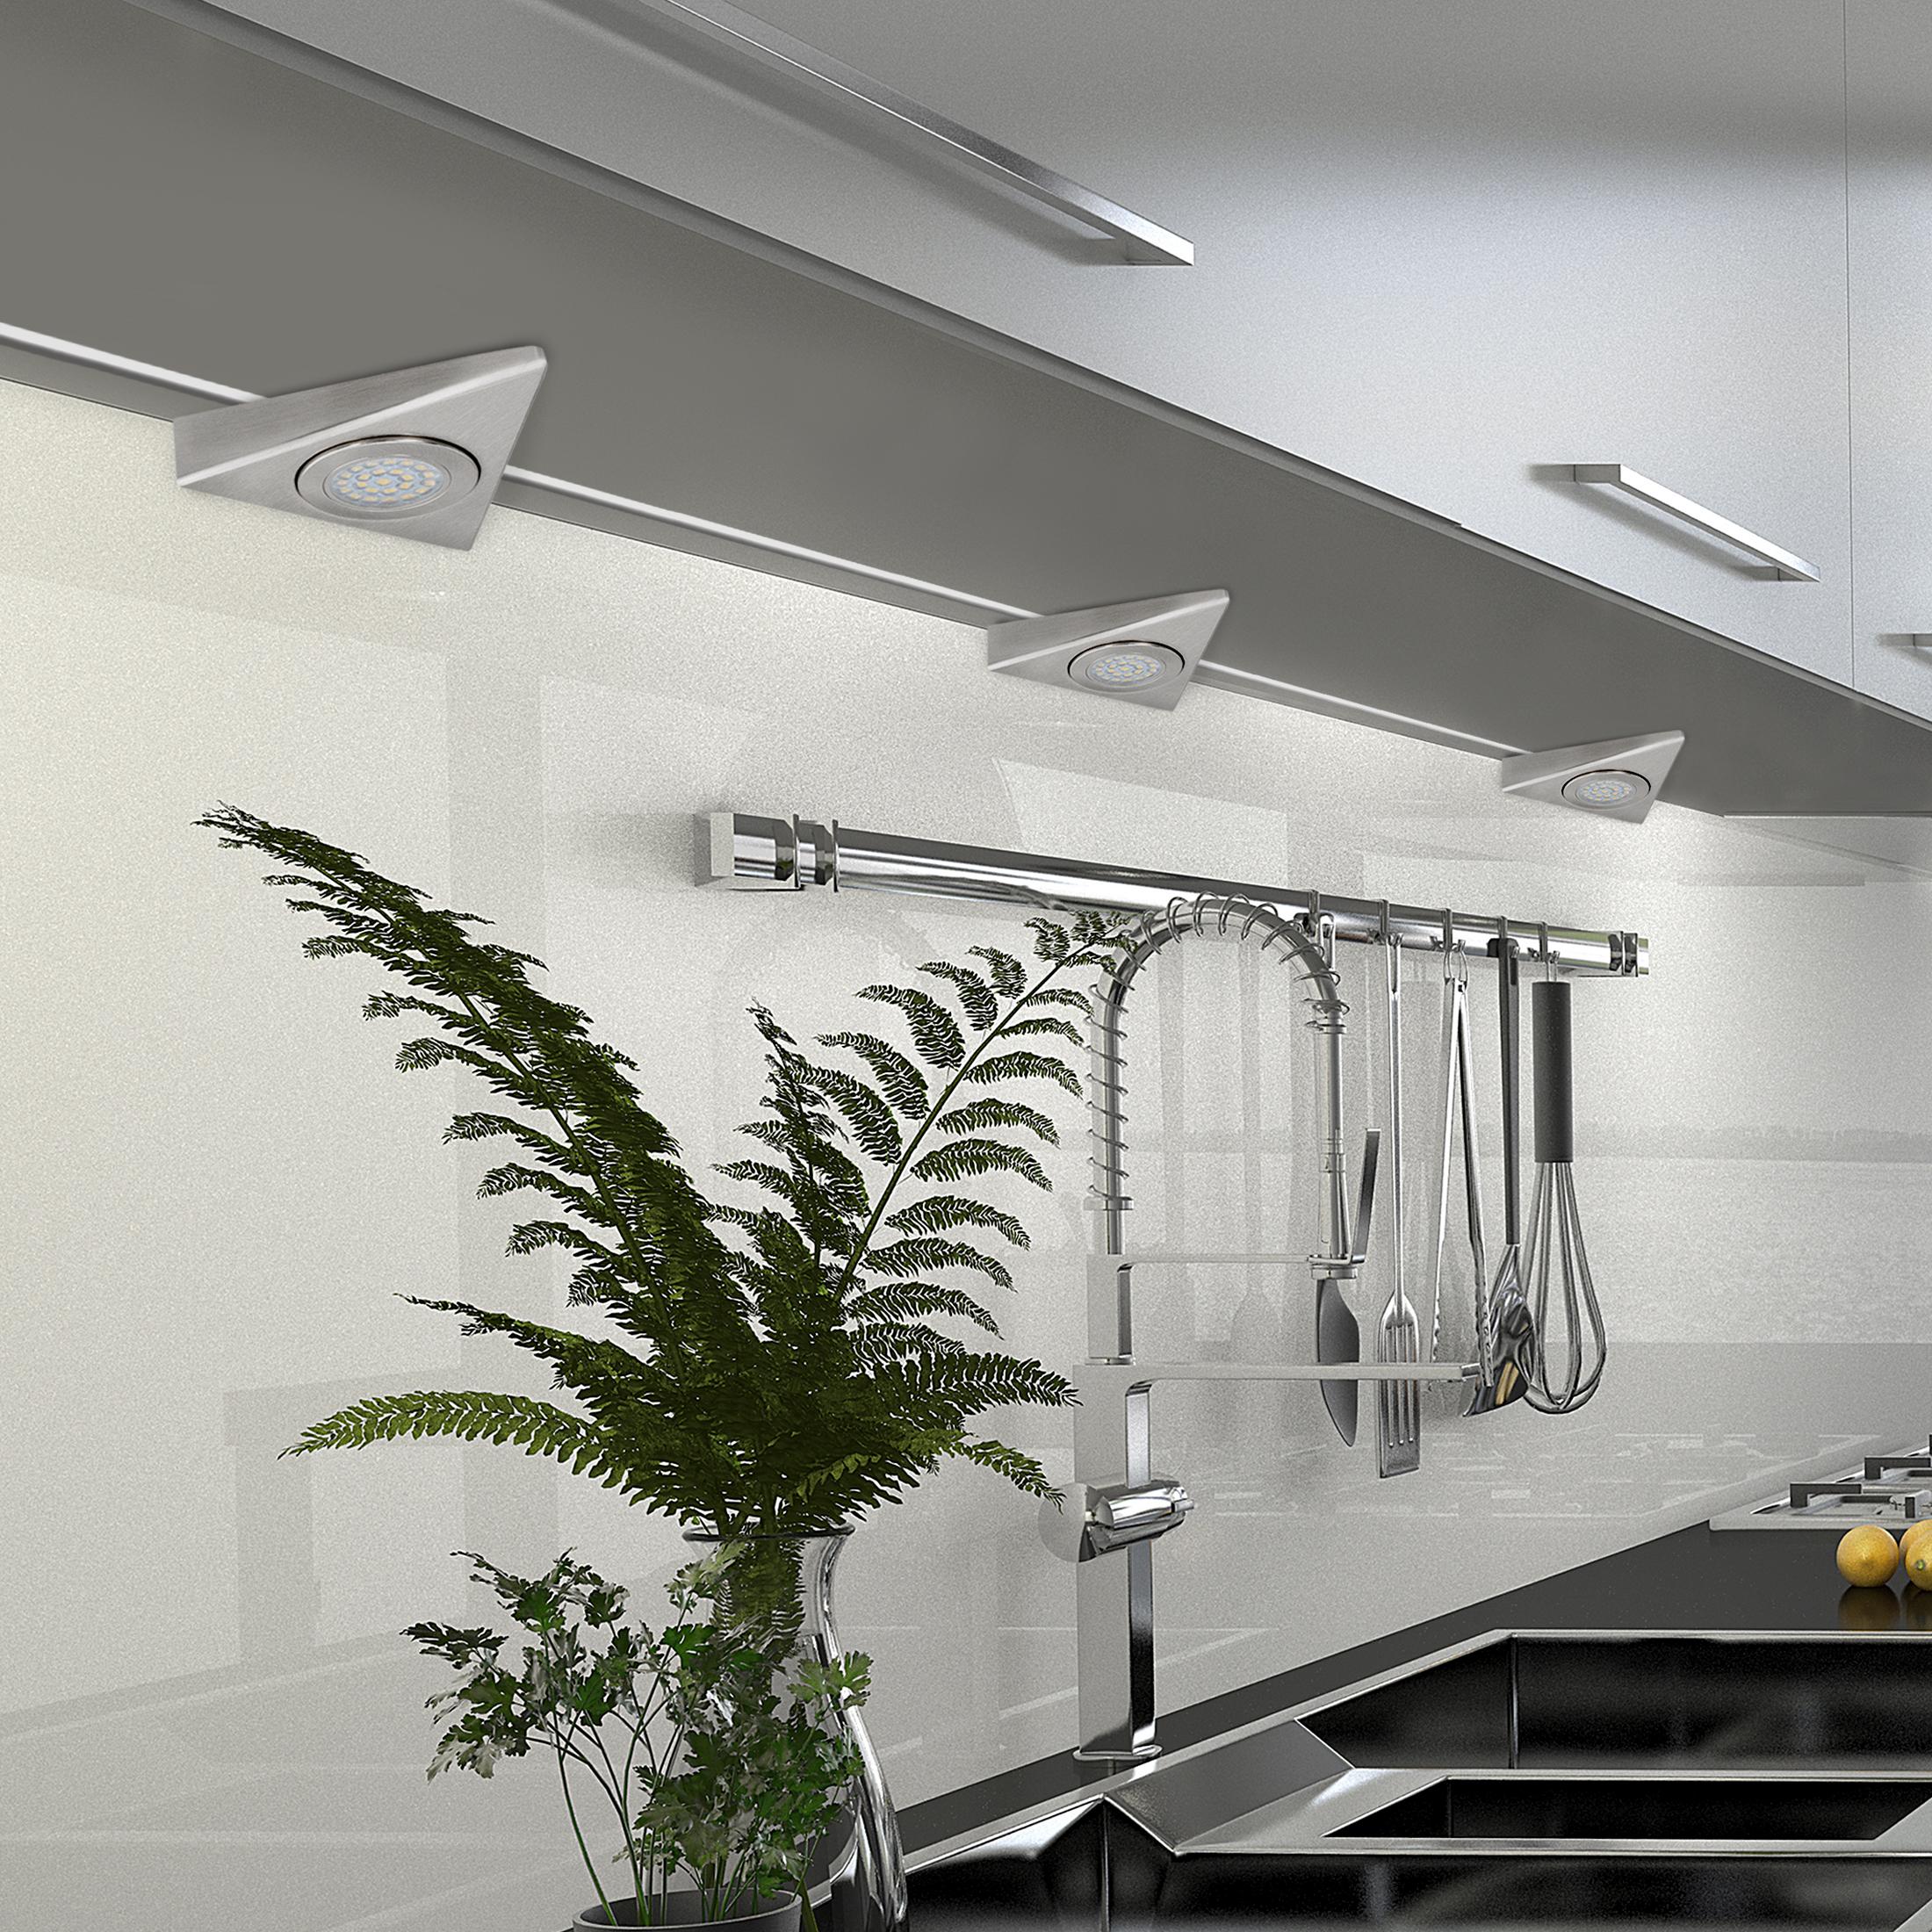 led dreieck m bel k chen unterbauleuchte stahl geb rstet 230v 1 5w neutralwei ebay. Black Bedroom Furniture Sets. Home Design Ideas